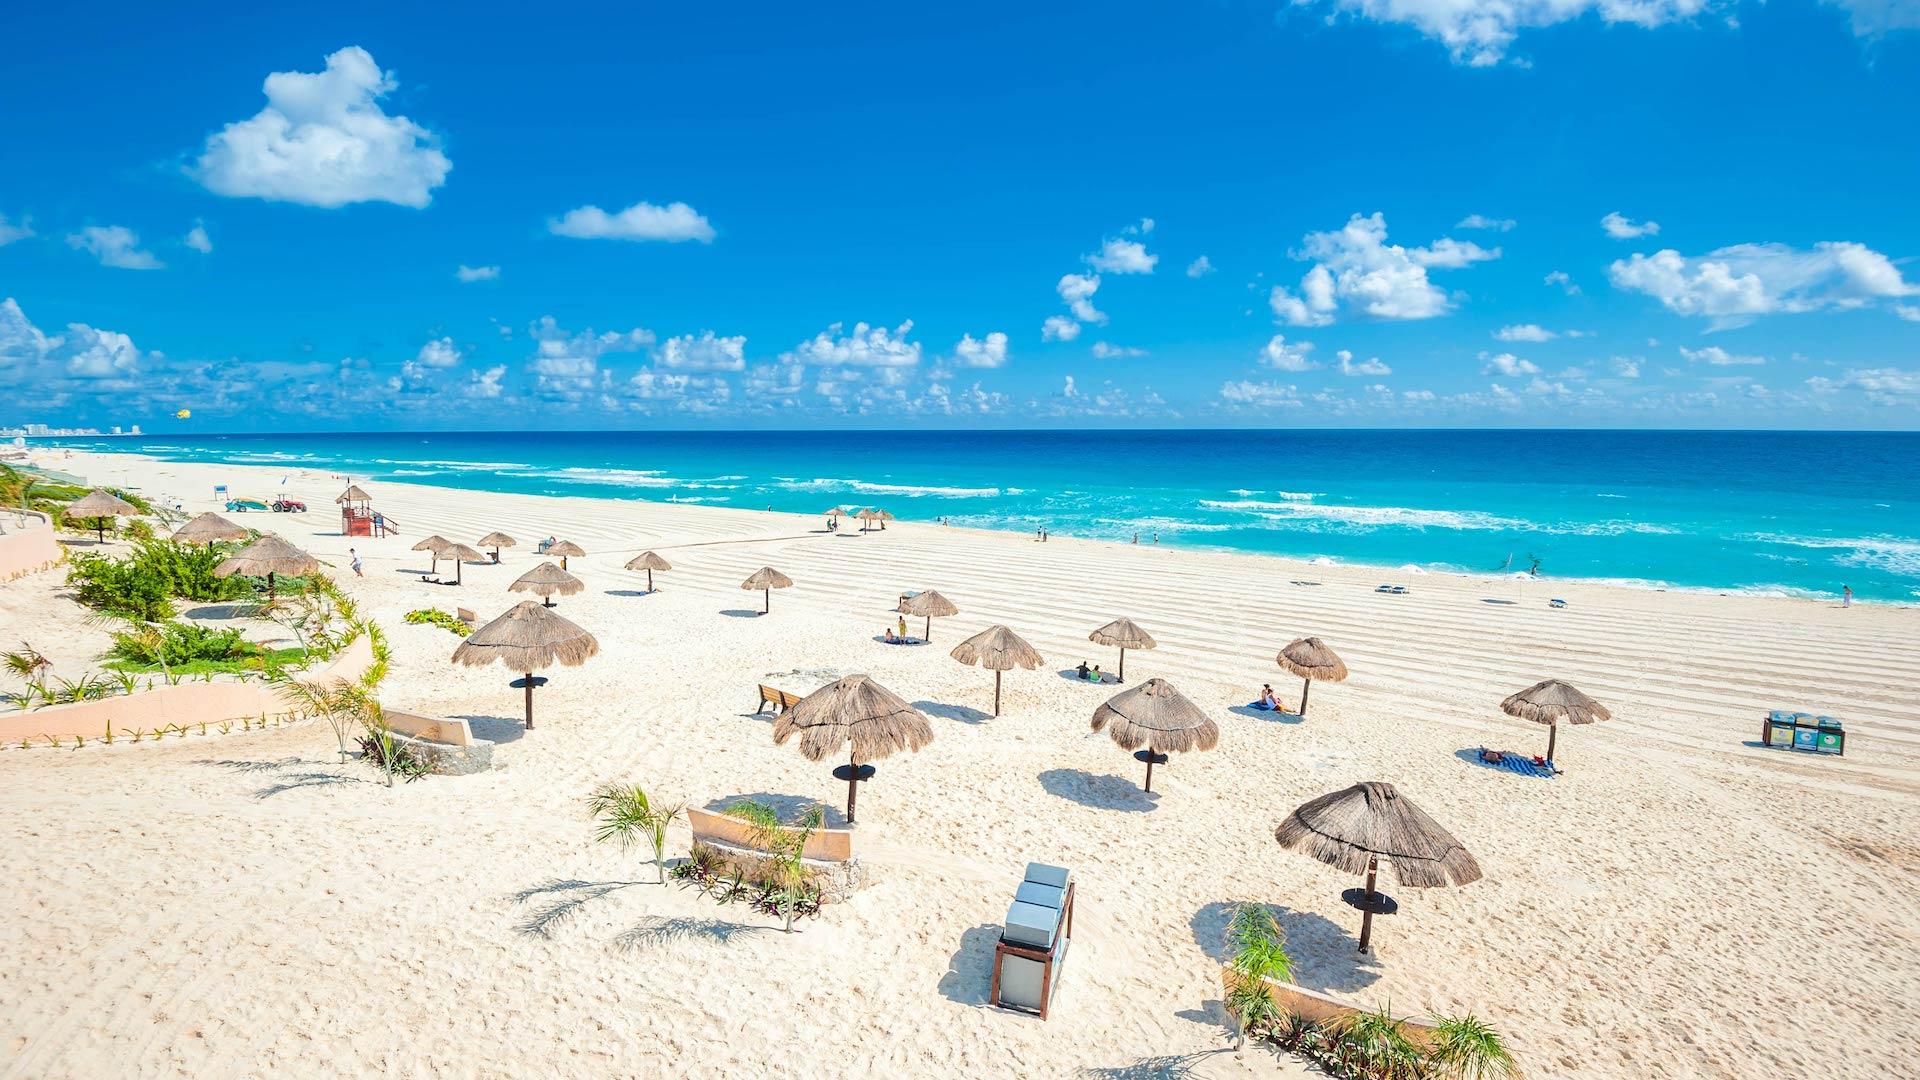 Así es la Ruta de Playas del Caribe de México